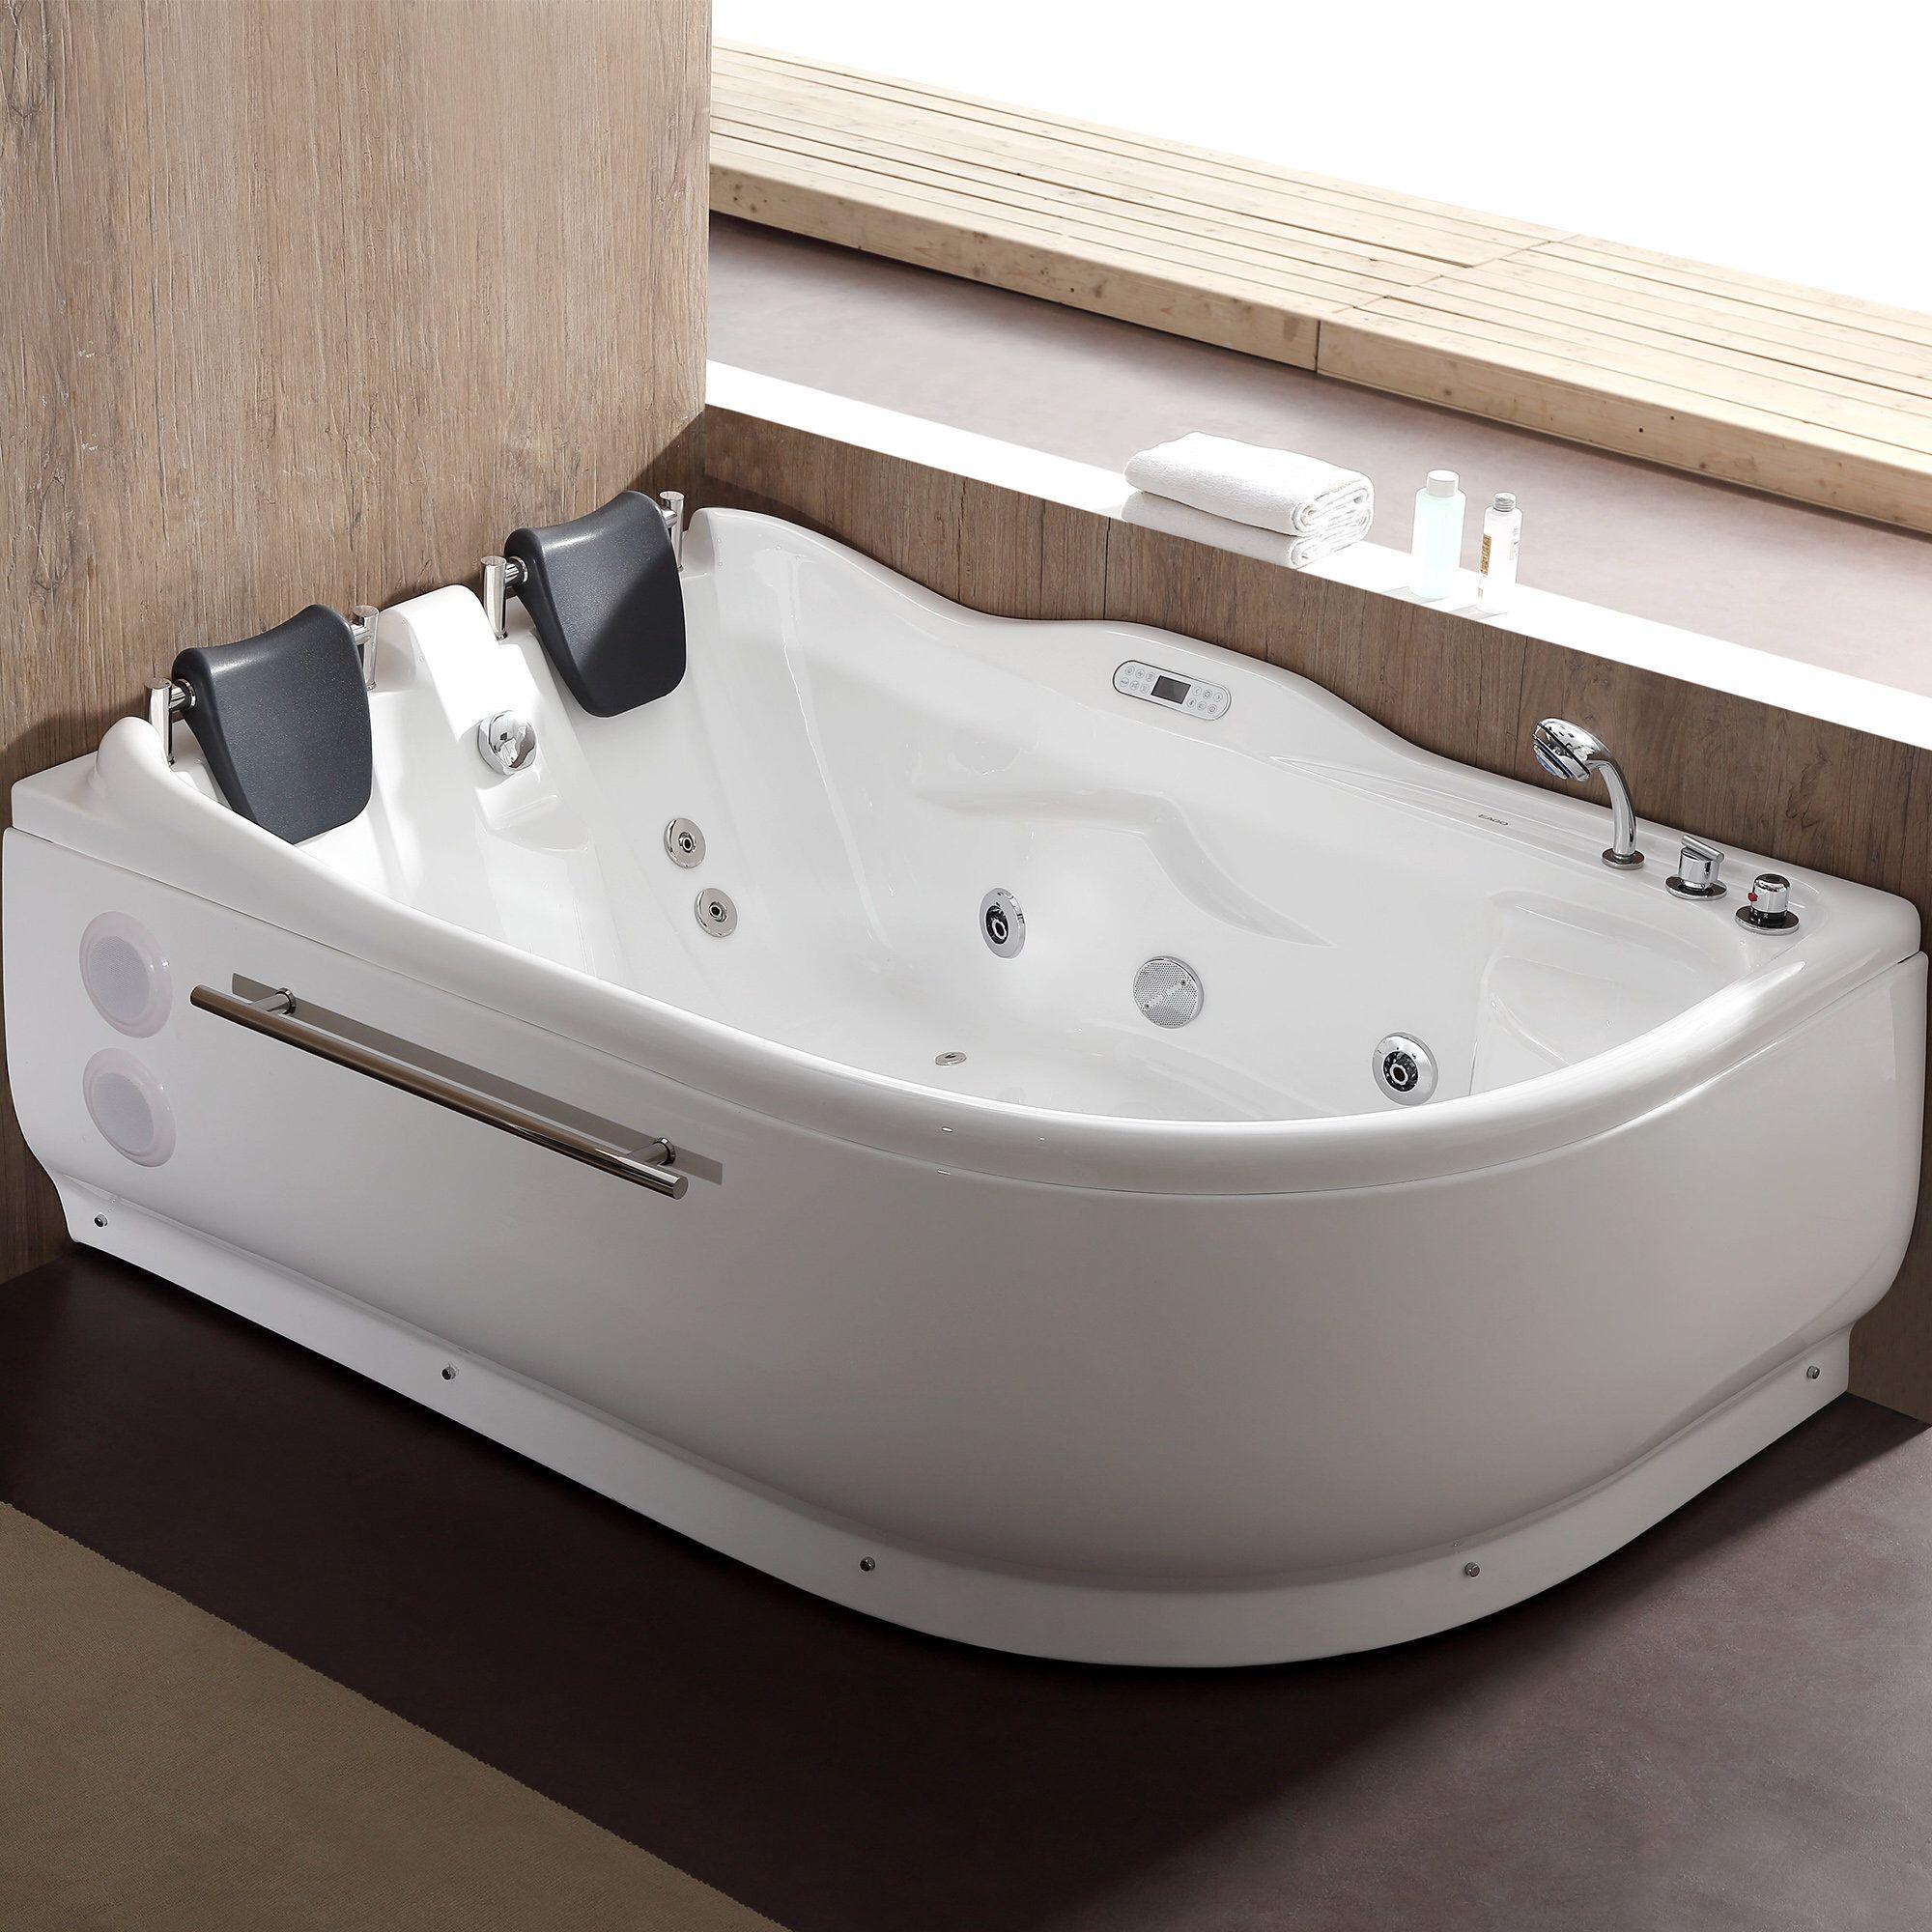 70 9 X 47 25 Corner Whirlpool Bathtub Whirlpool Bathtub